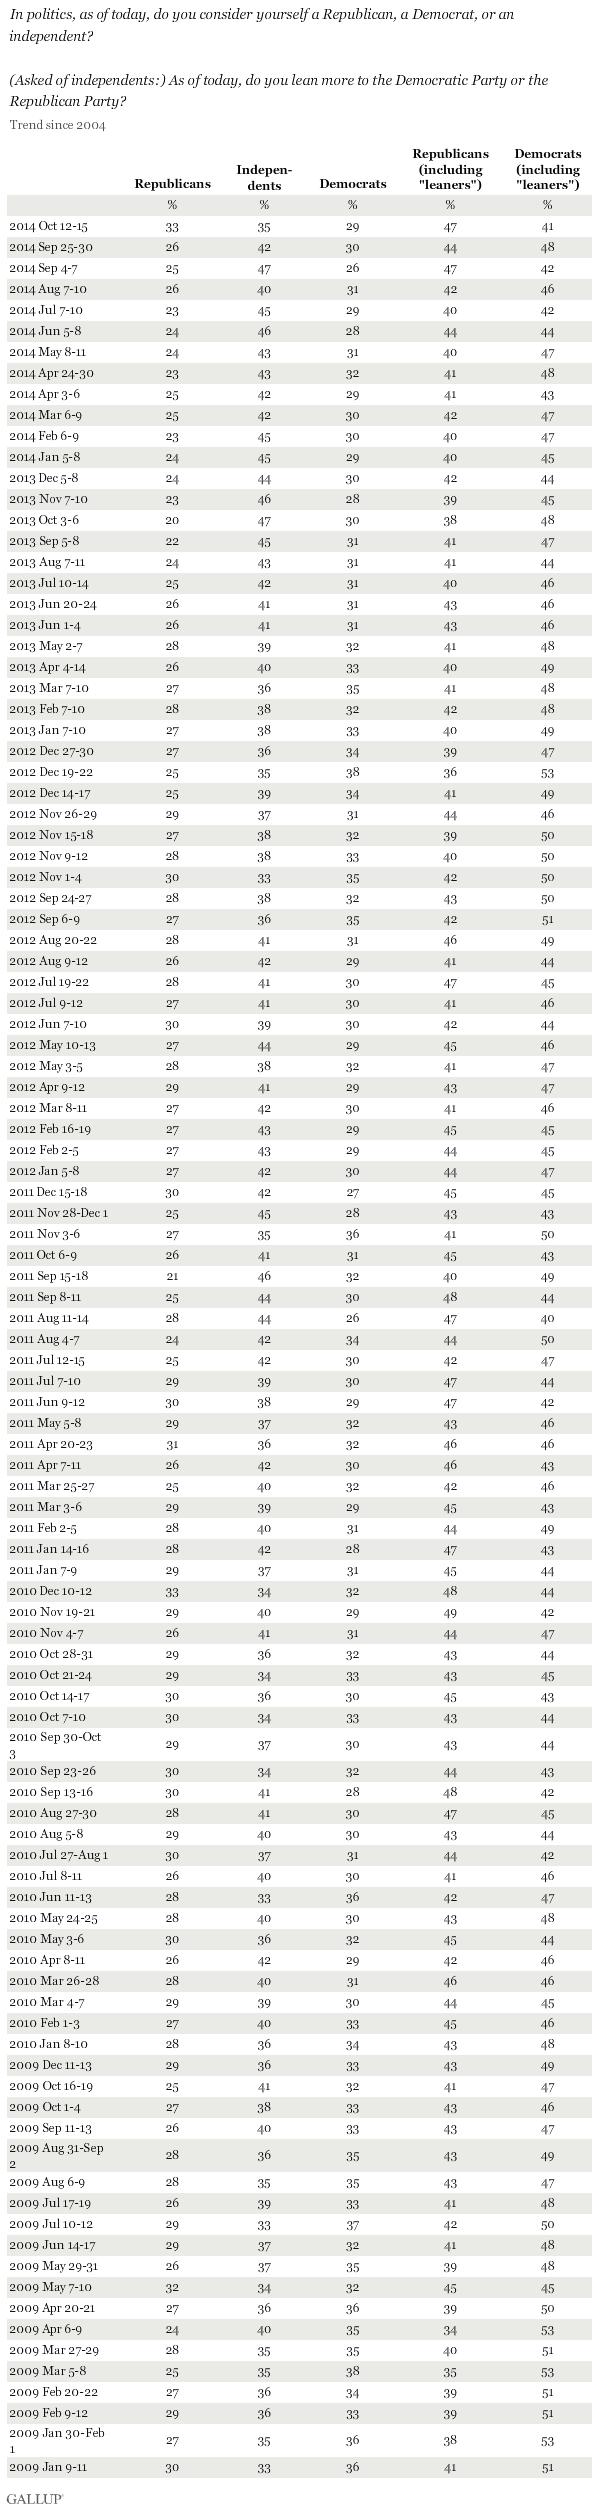 24d3c094defd Party affiliation in U.S. plus leaners